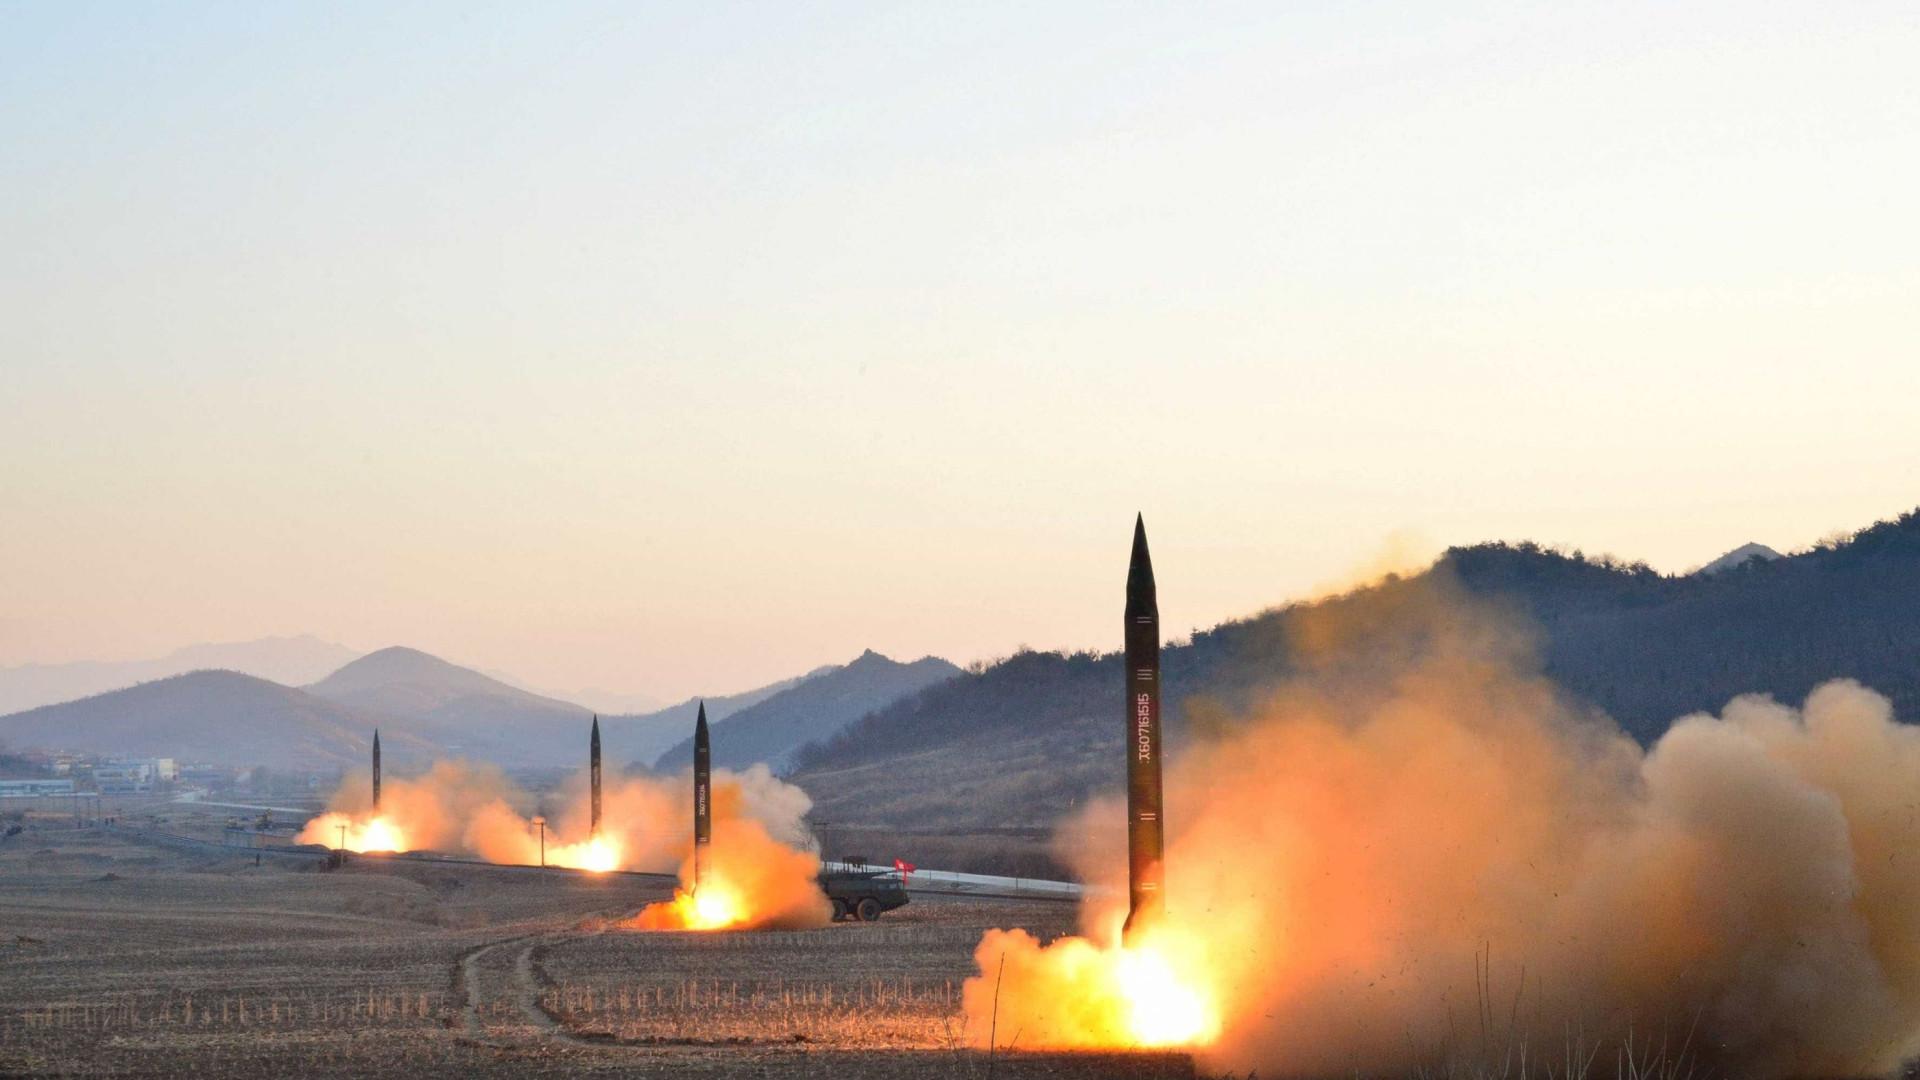 Coreia do Norte está a testar novos mísseis